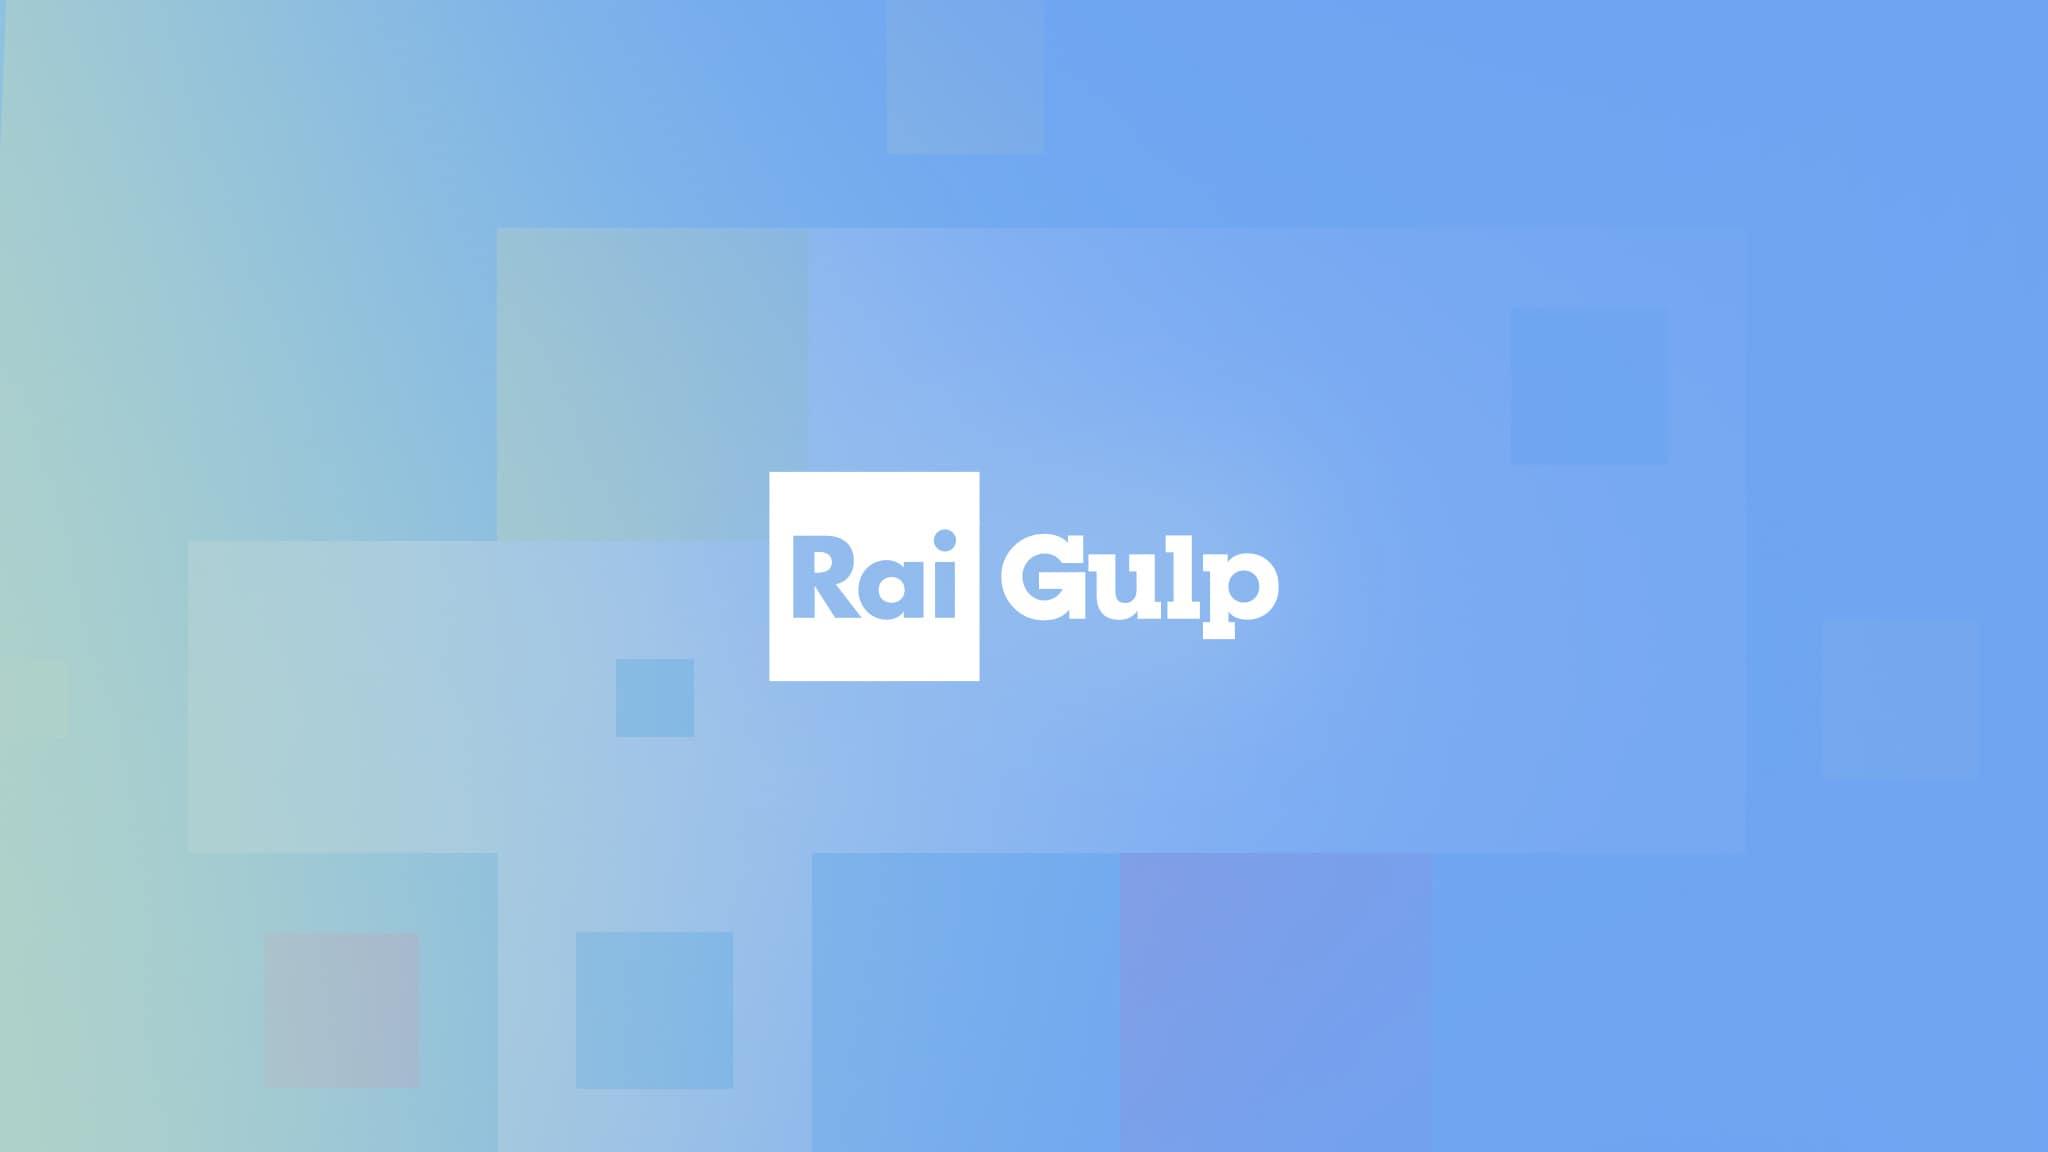 Rai Gulp 101 Dalmatian Street - S1E2